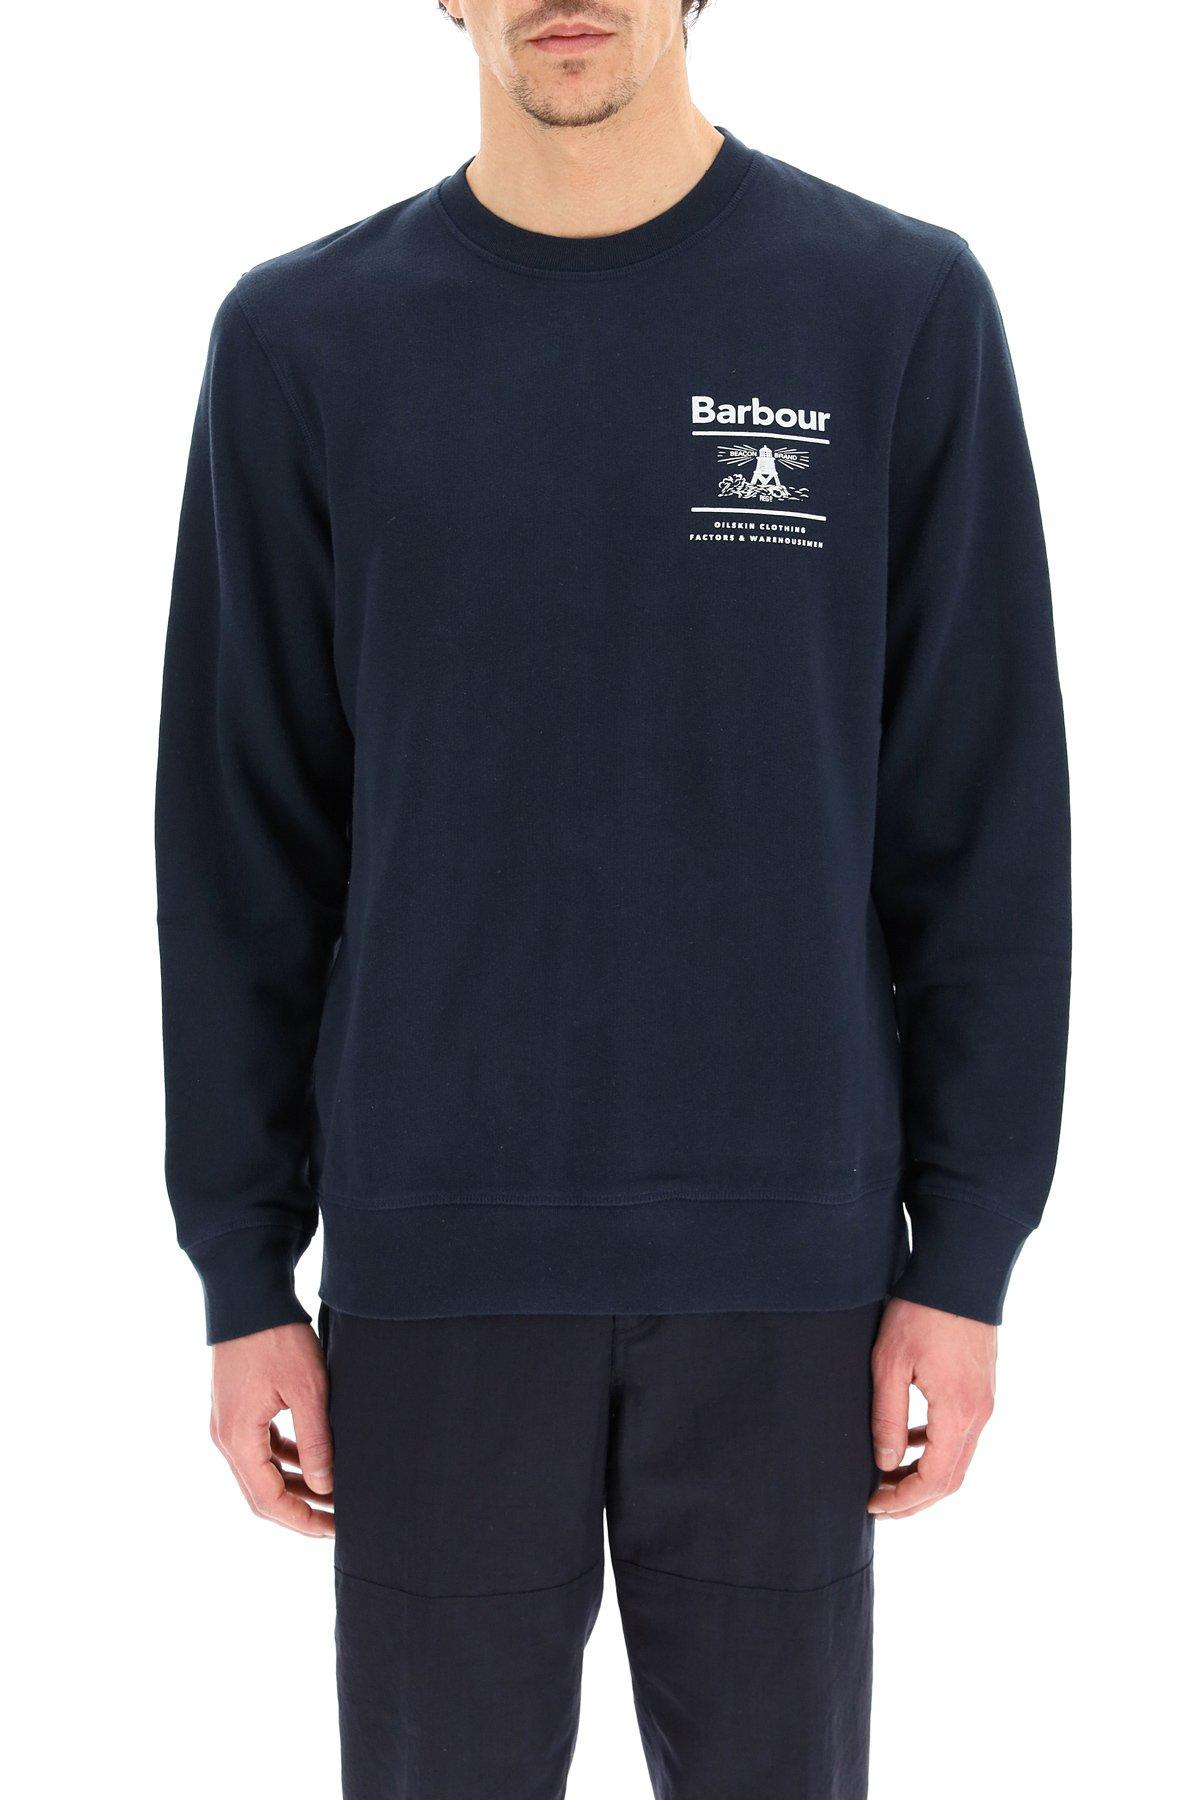 Barbour felpa logo barbour reed